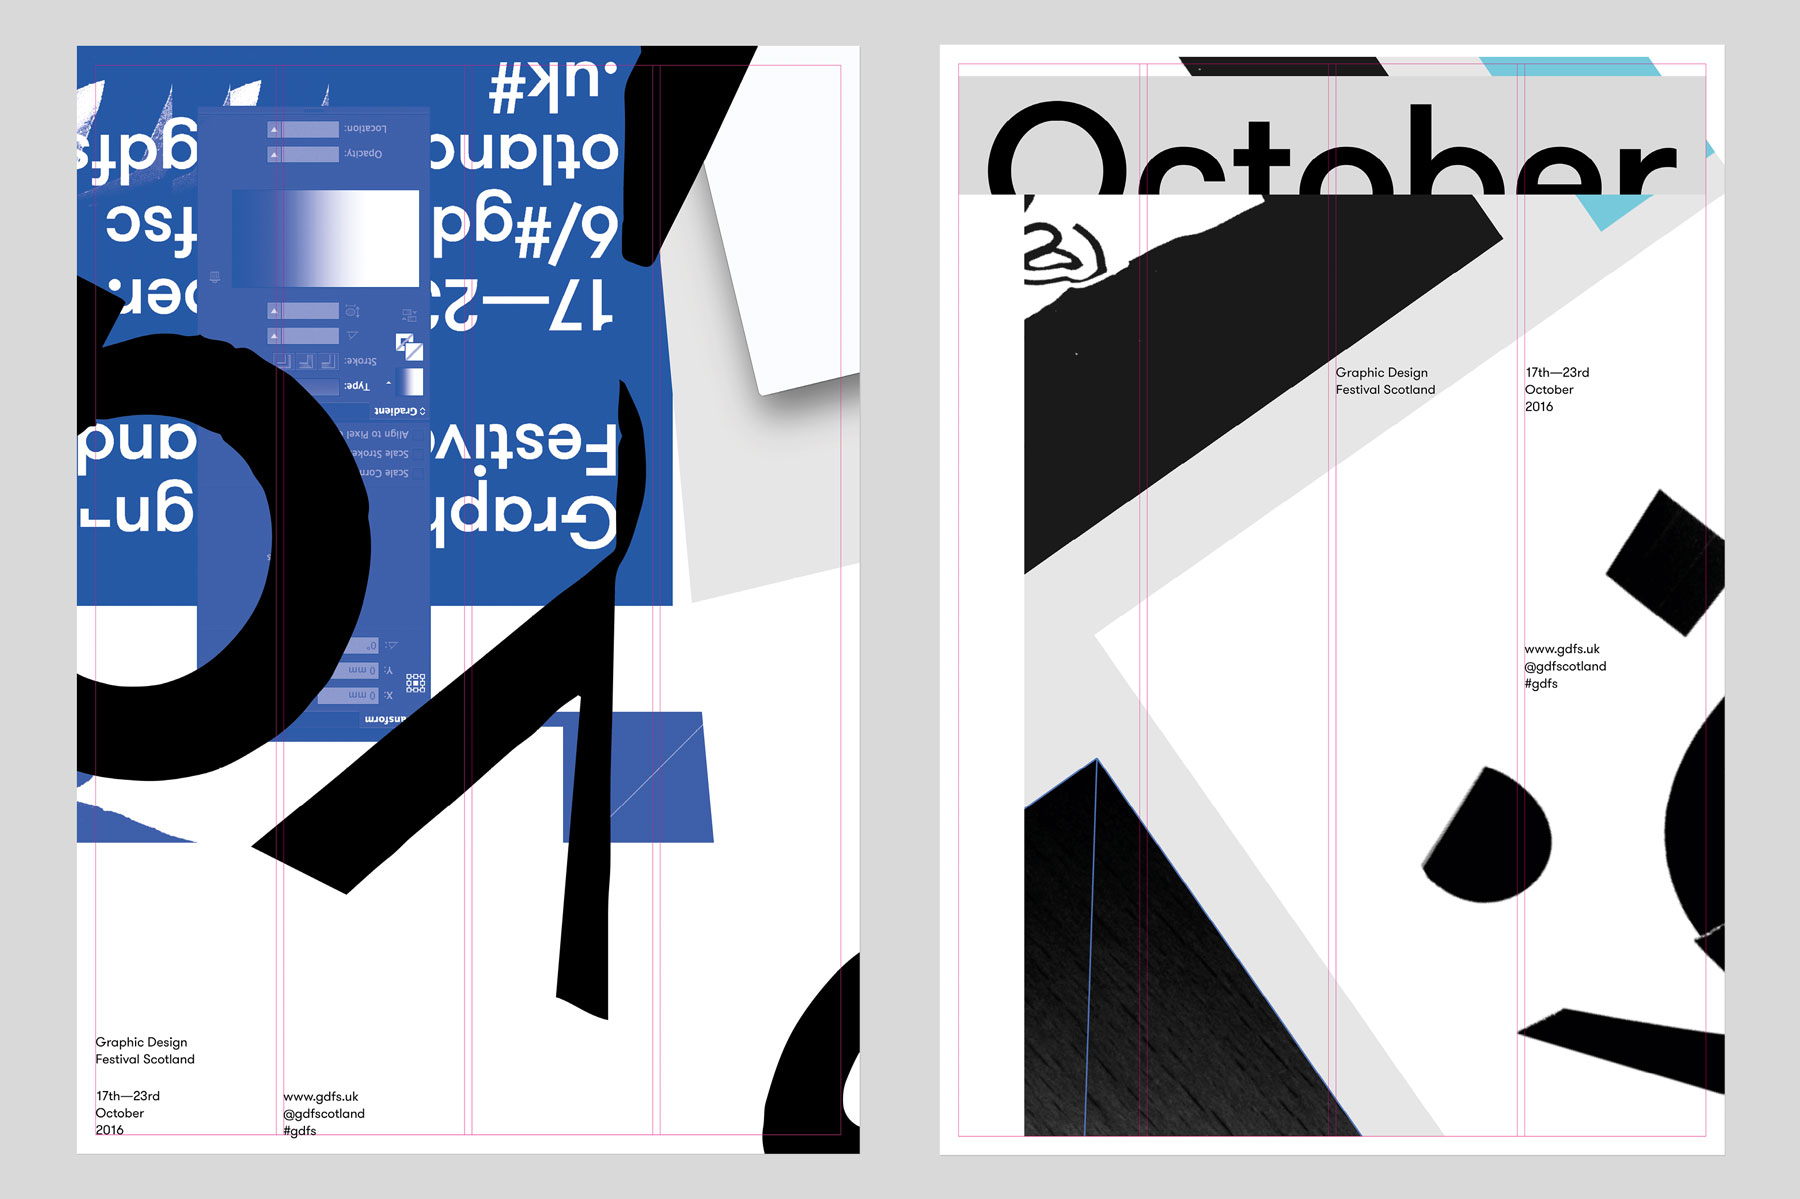 5gdfs-16-custom-identity-posters